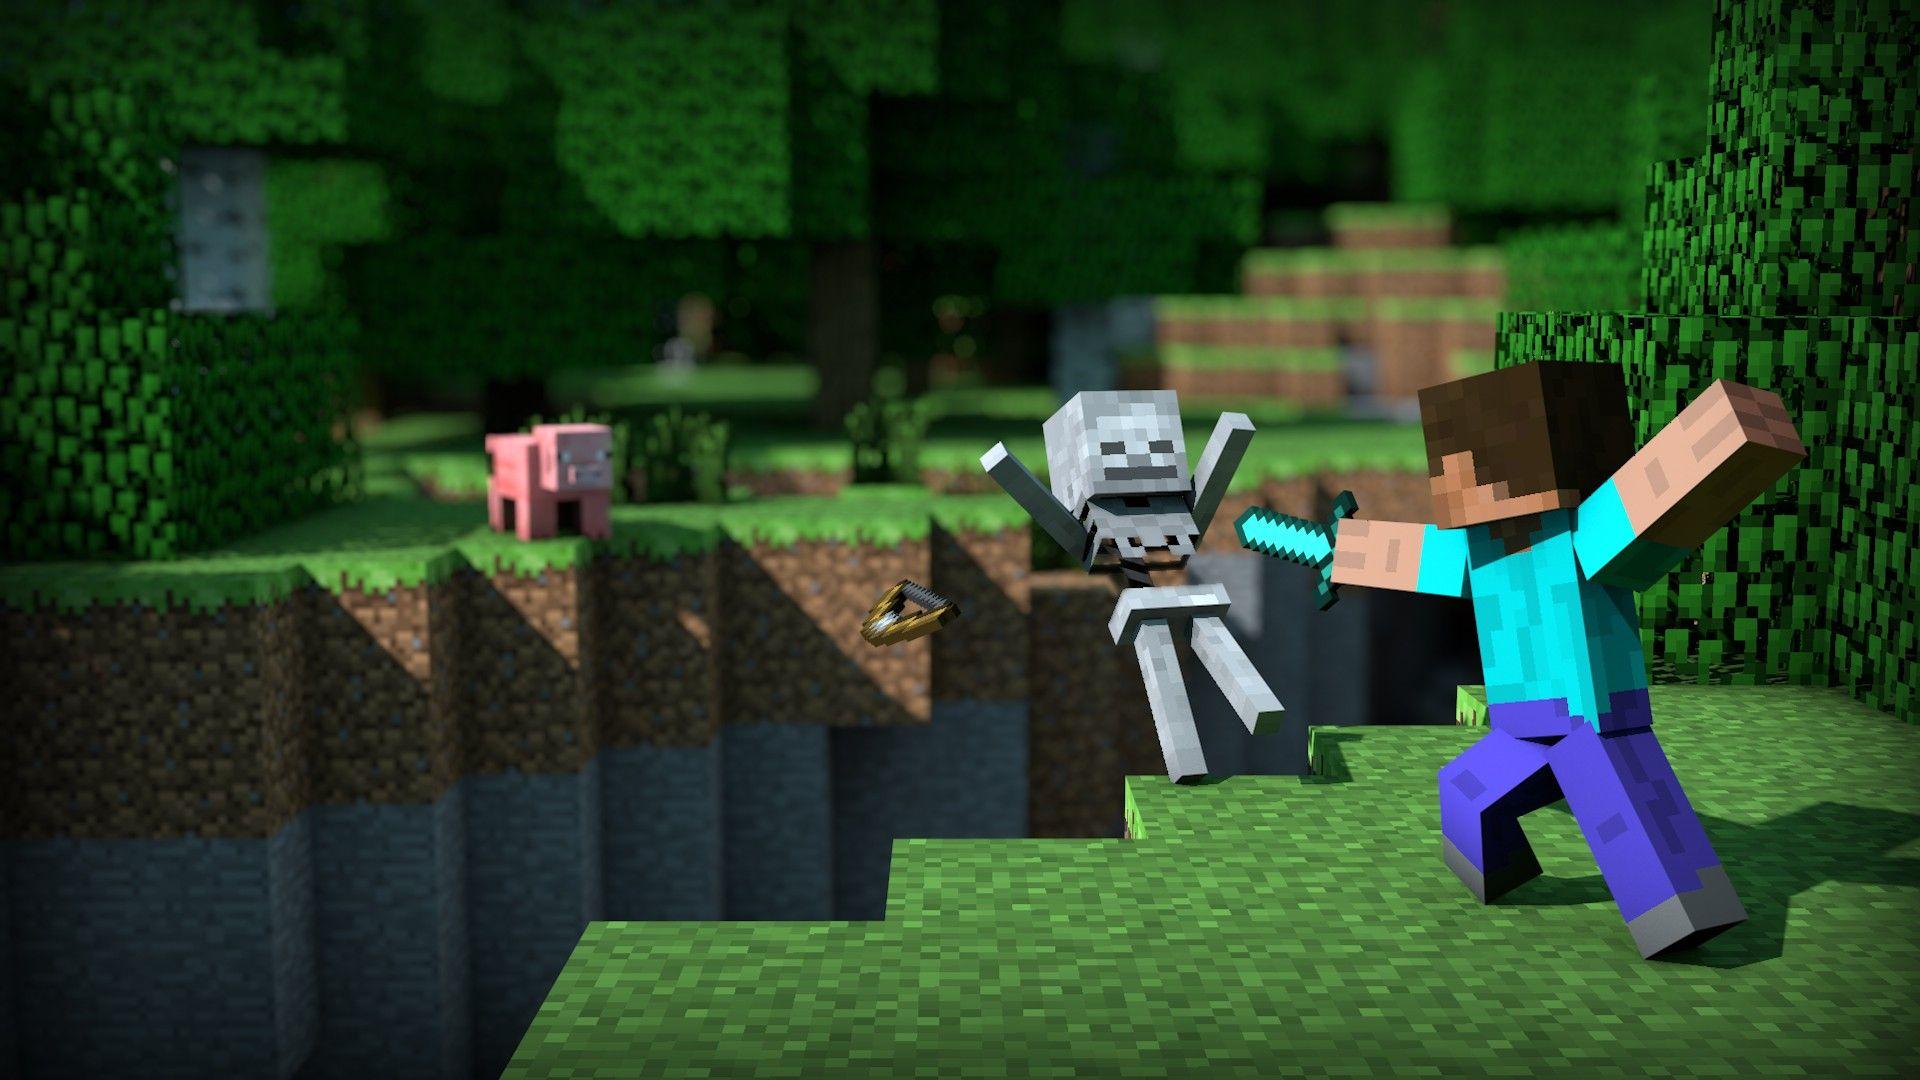 Video Game Minecraft Wallpaper Minecraft Kecerdasan Buatan